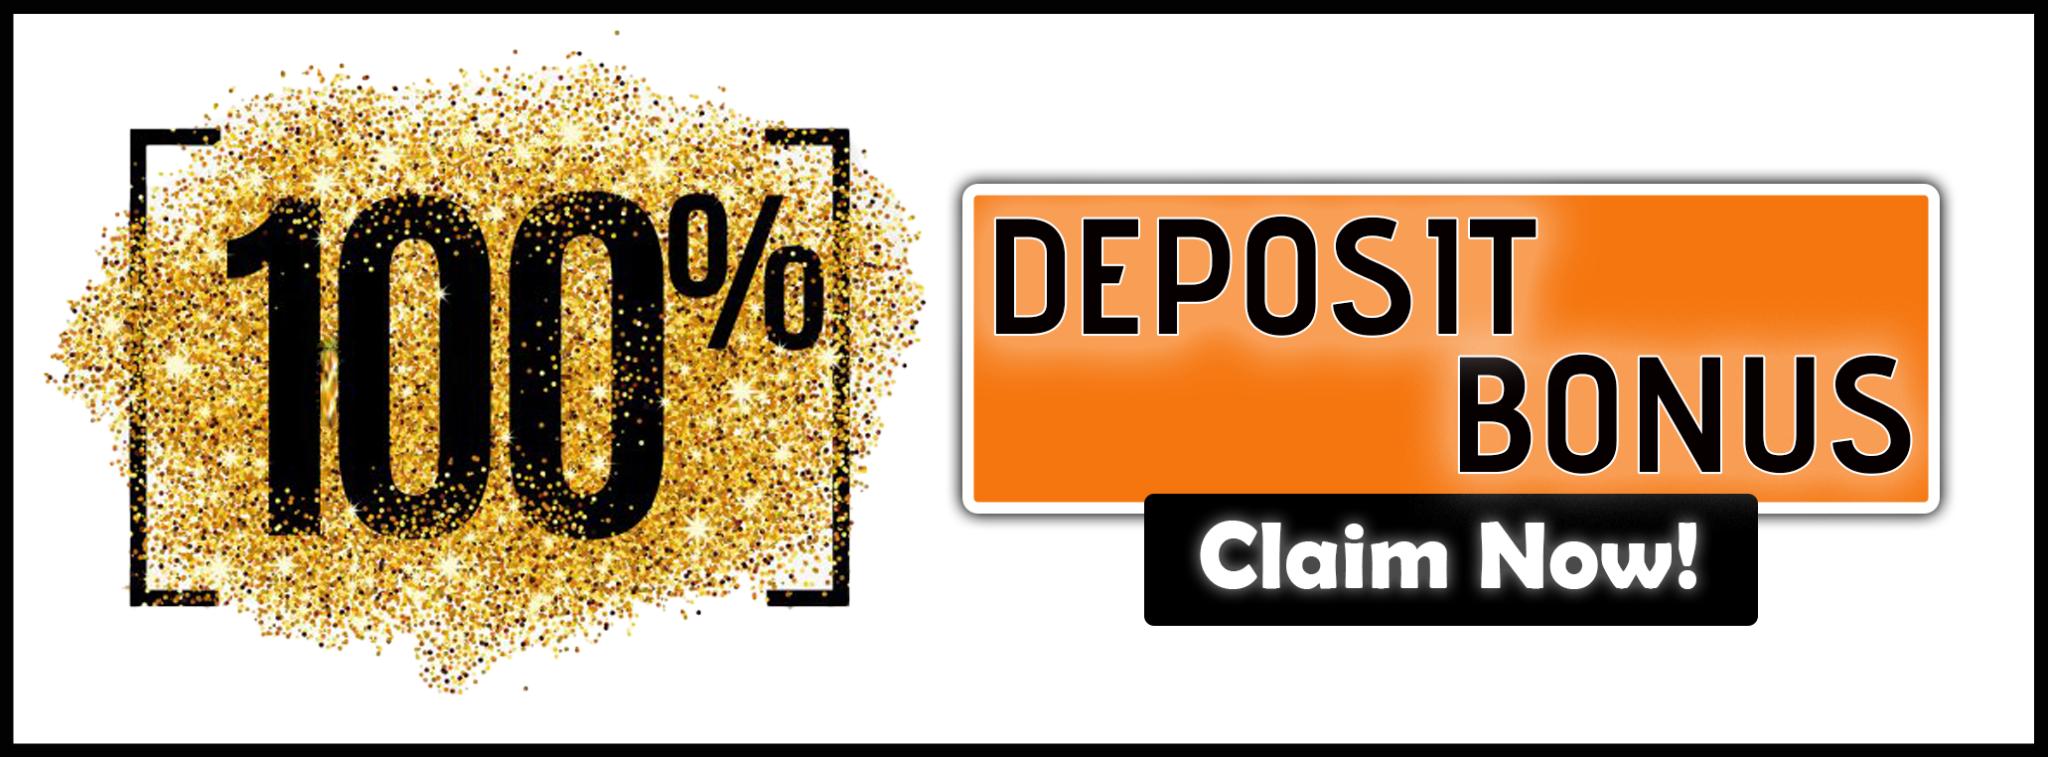 xm-deposit-bonus-100